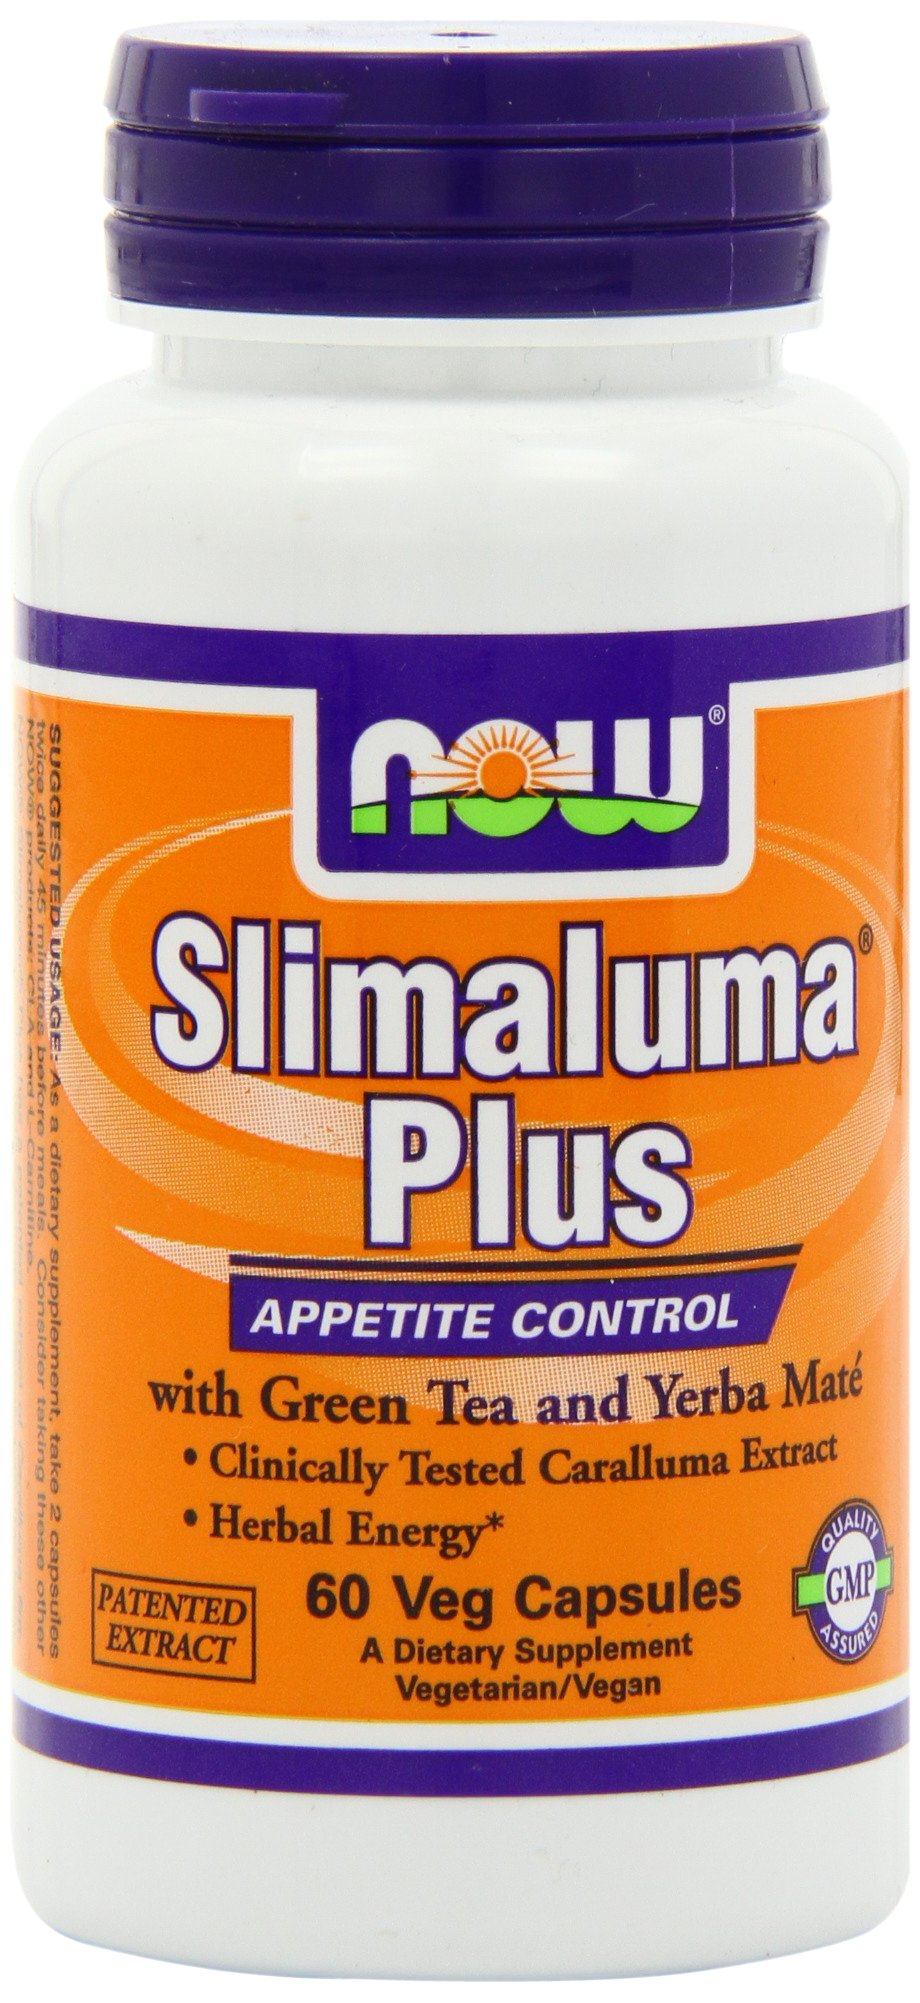 NOW  Slimaluma Plus,60 Veg Capsules